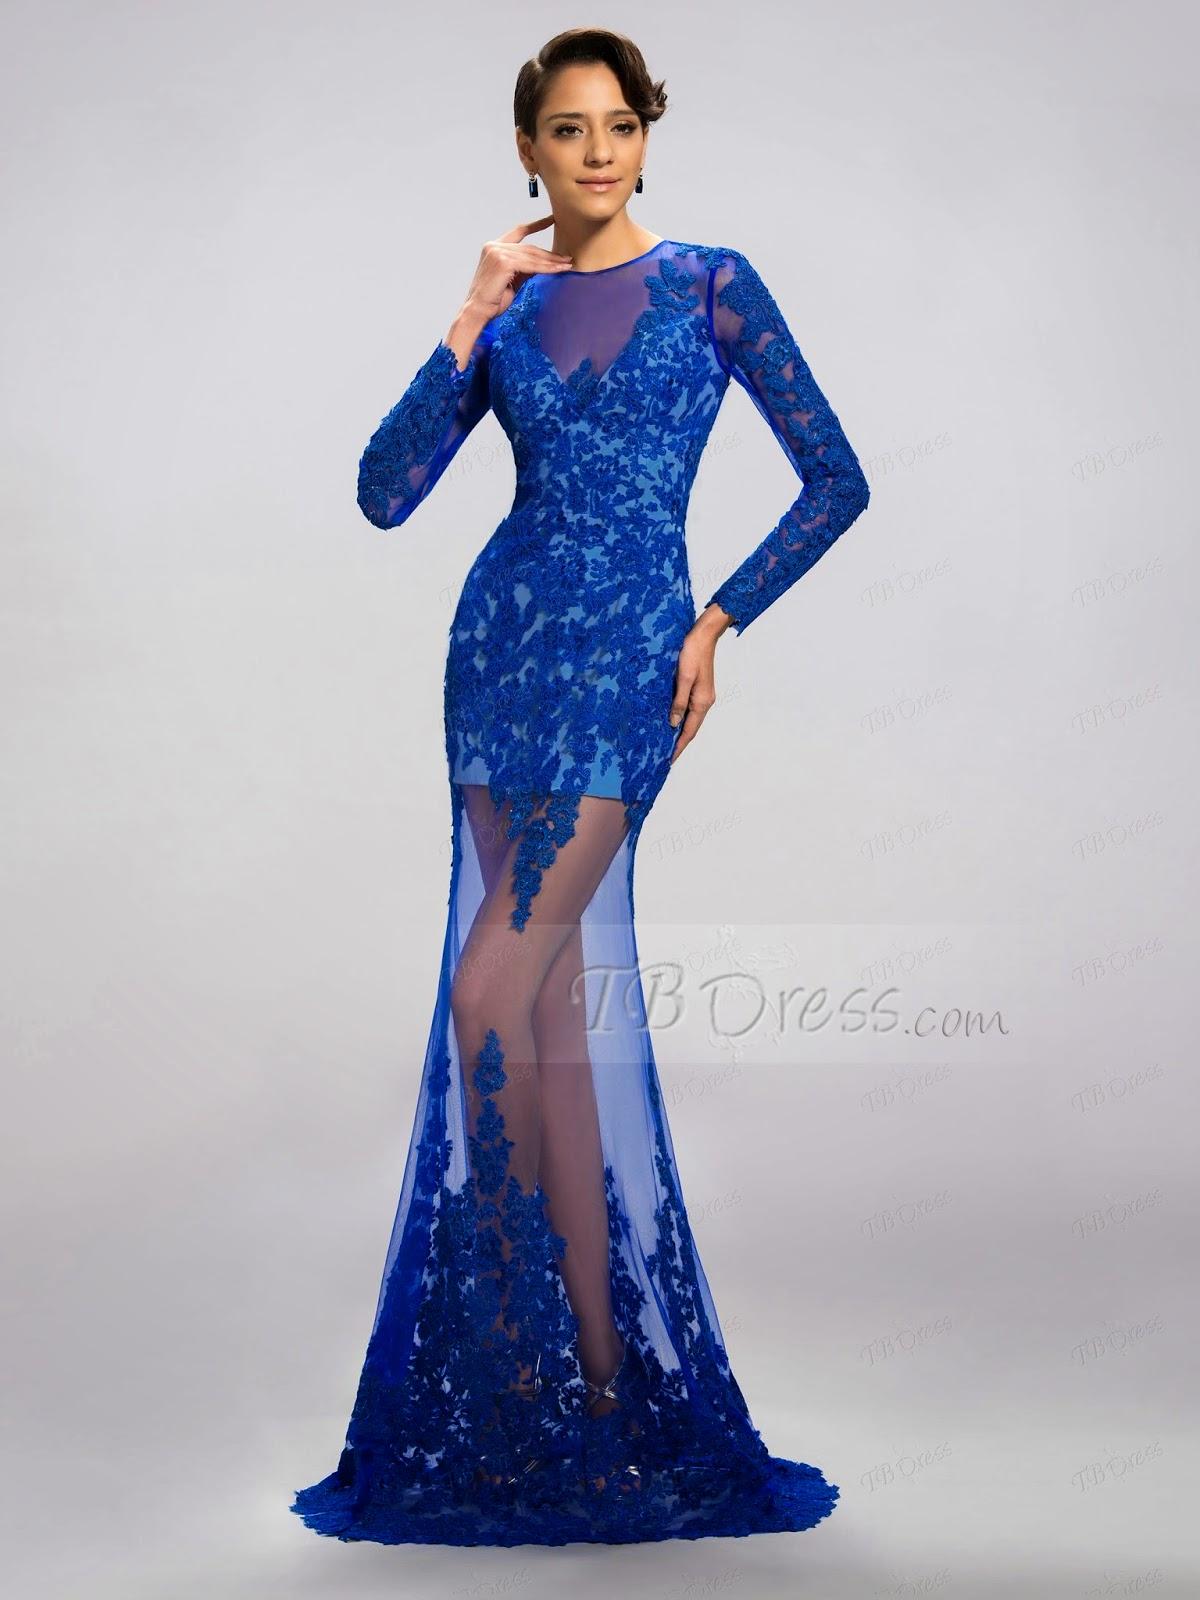 Cheap Formal Dresses For Women - Laura Williams